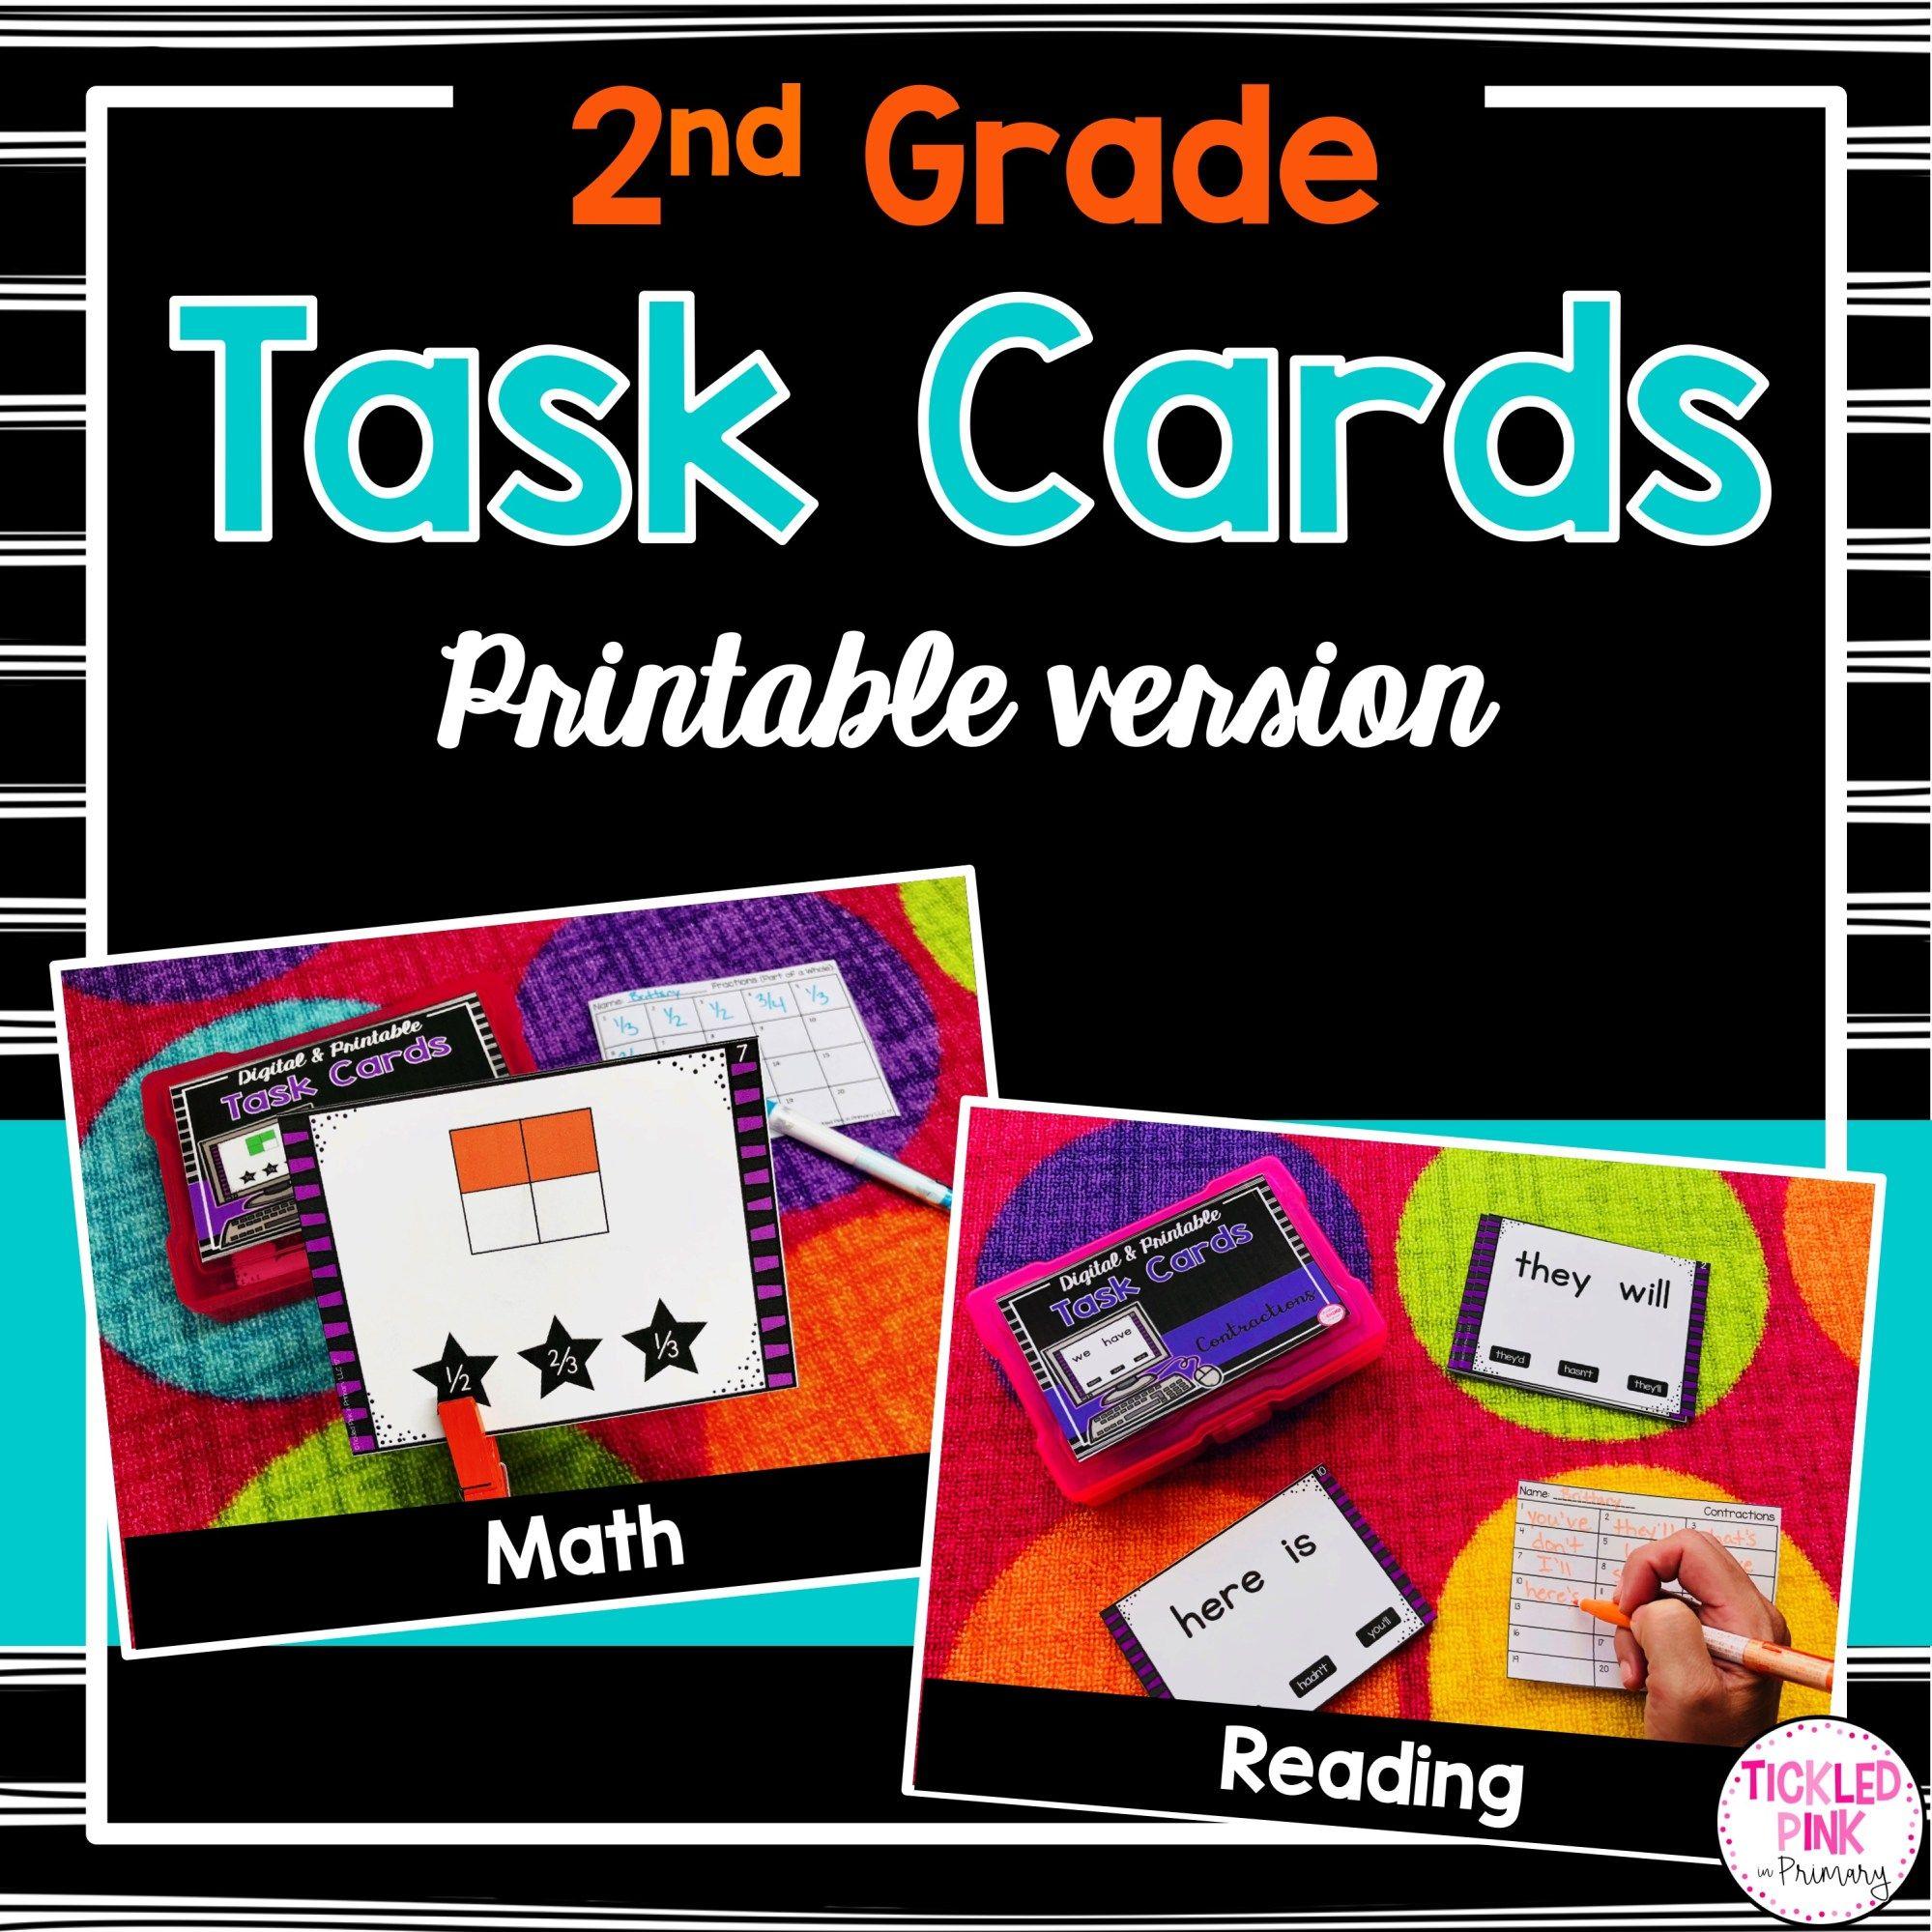 2nd Grade Task Cards Printable Version